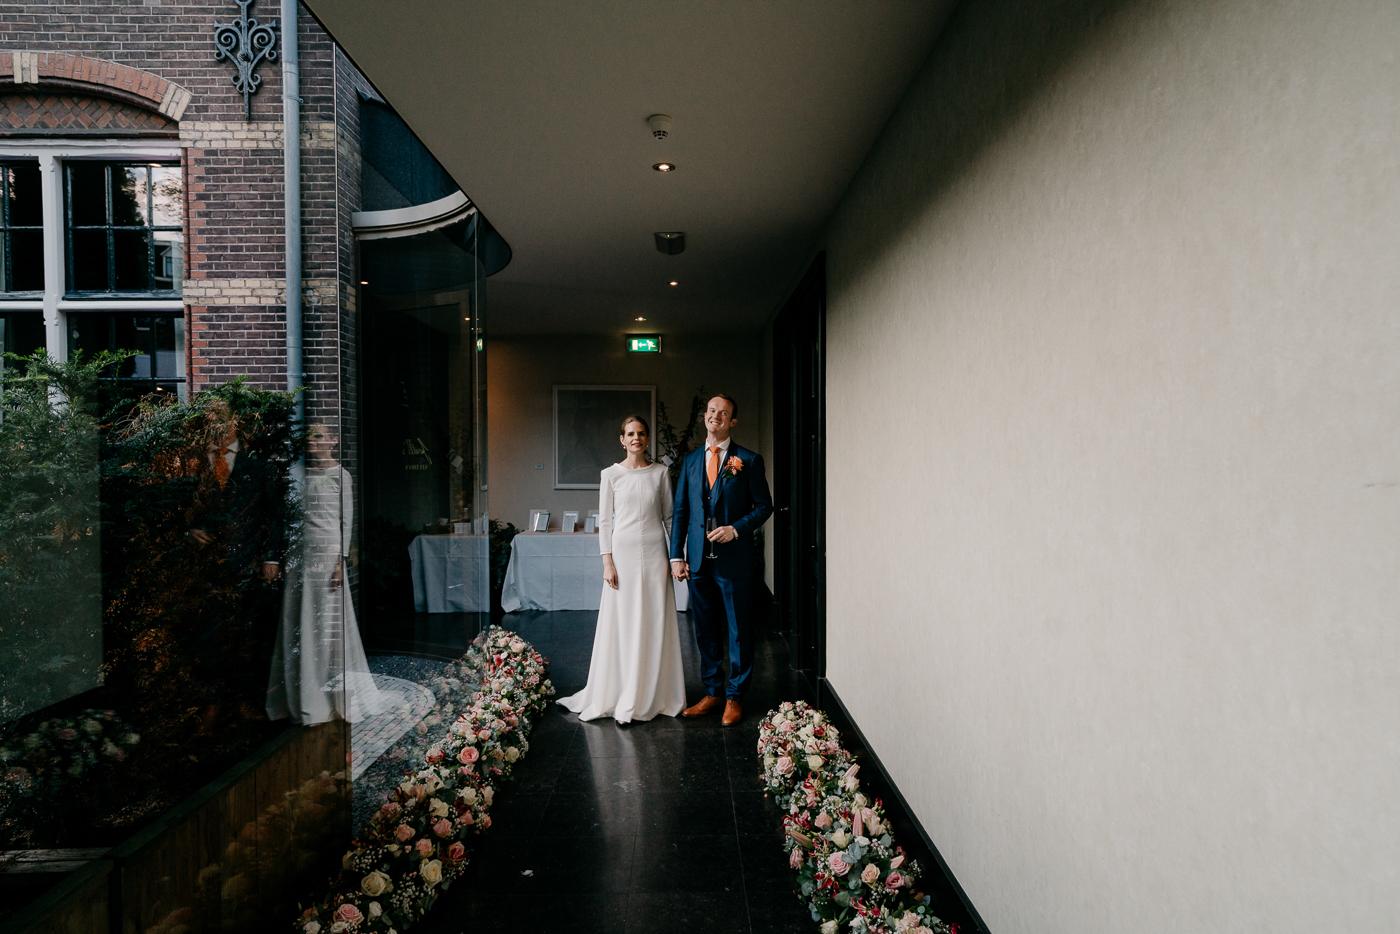 bruidsfotografie-trouwfotograaf-wedding-photographer-amsterdam-James-Jantine-356.jpg